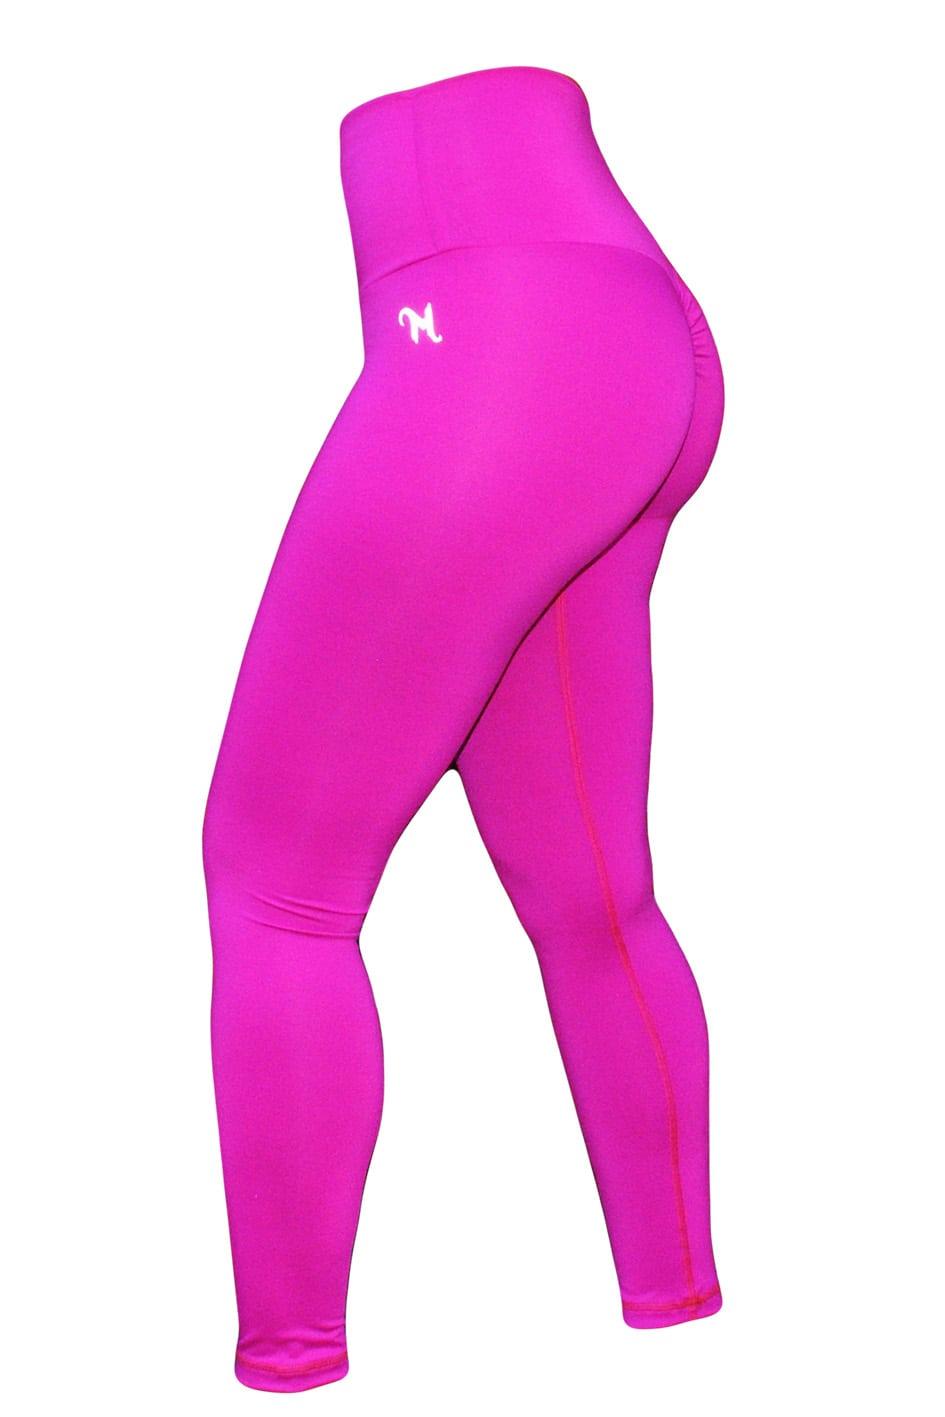 Sportlegging Roze.High Waist Sportlegging Dames Roze Mfit Bodybuildingkleding Com